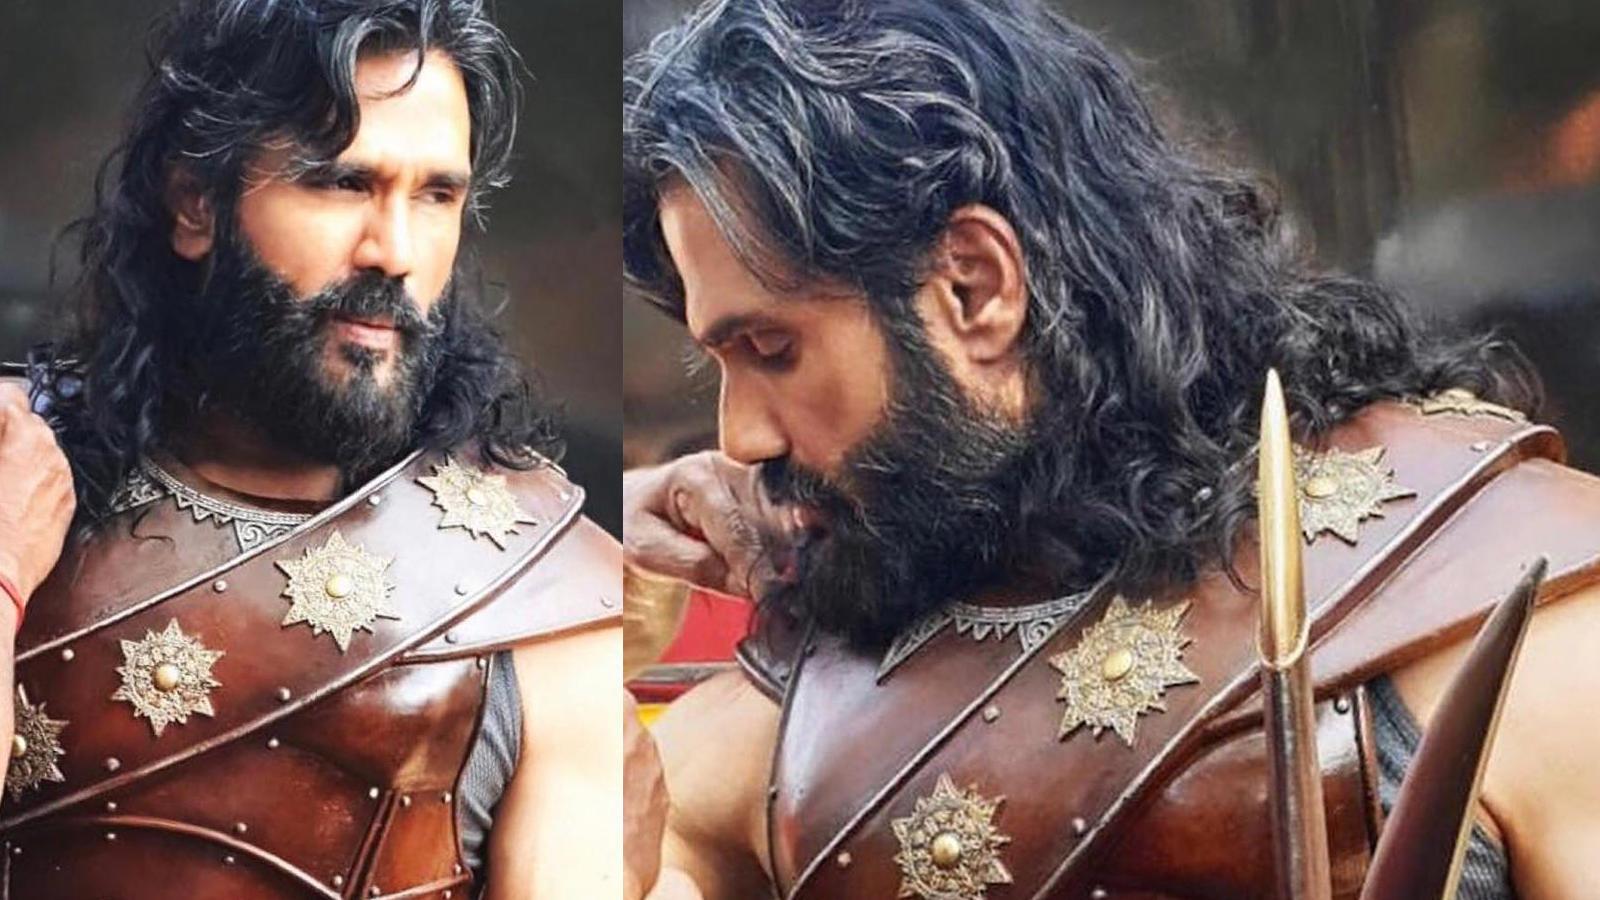 Suniel Shetty as fierce warrior in Priyadarshan period thriller 'Marakkar: The Lion of Arabian Sea'